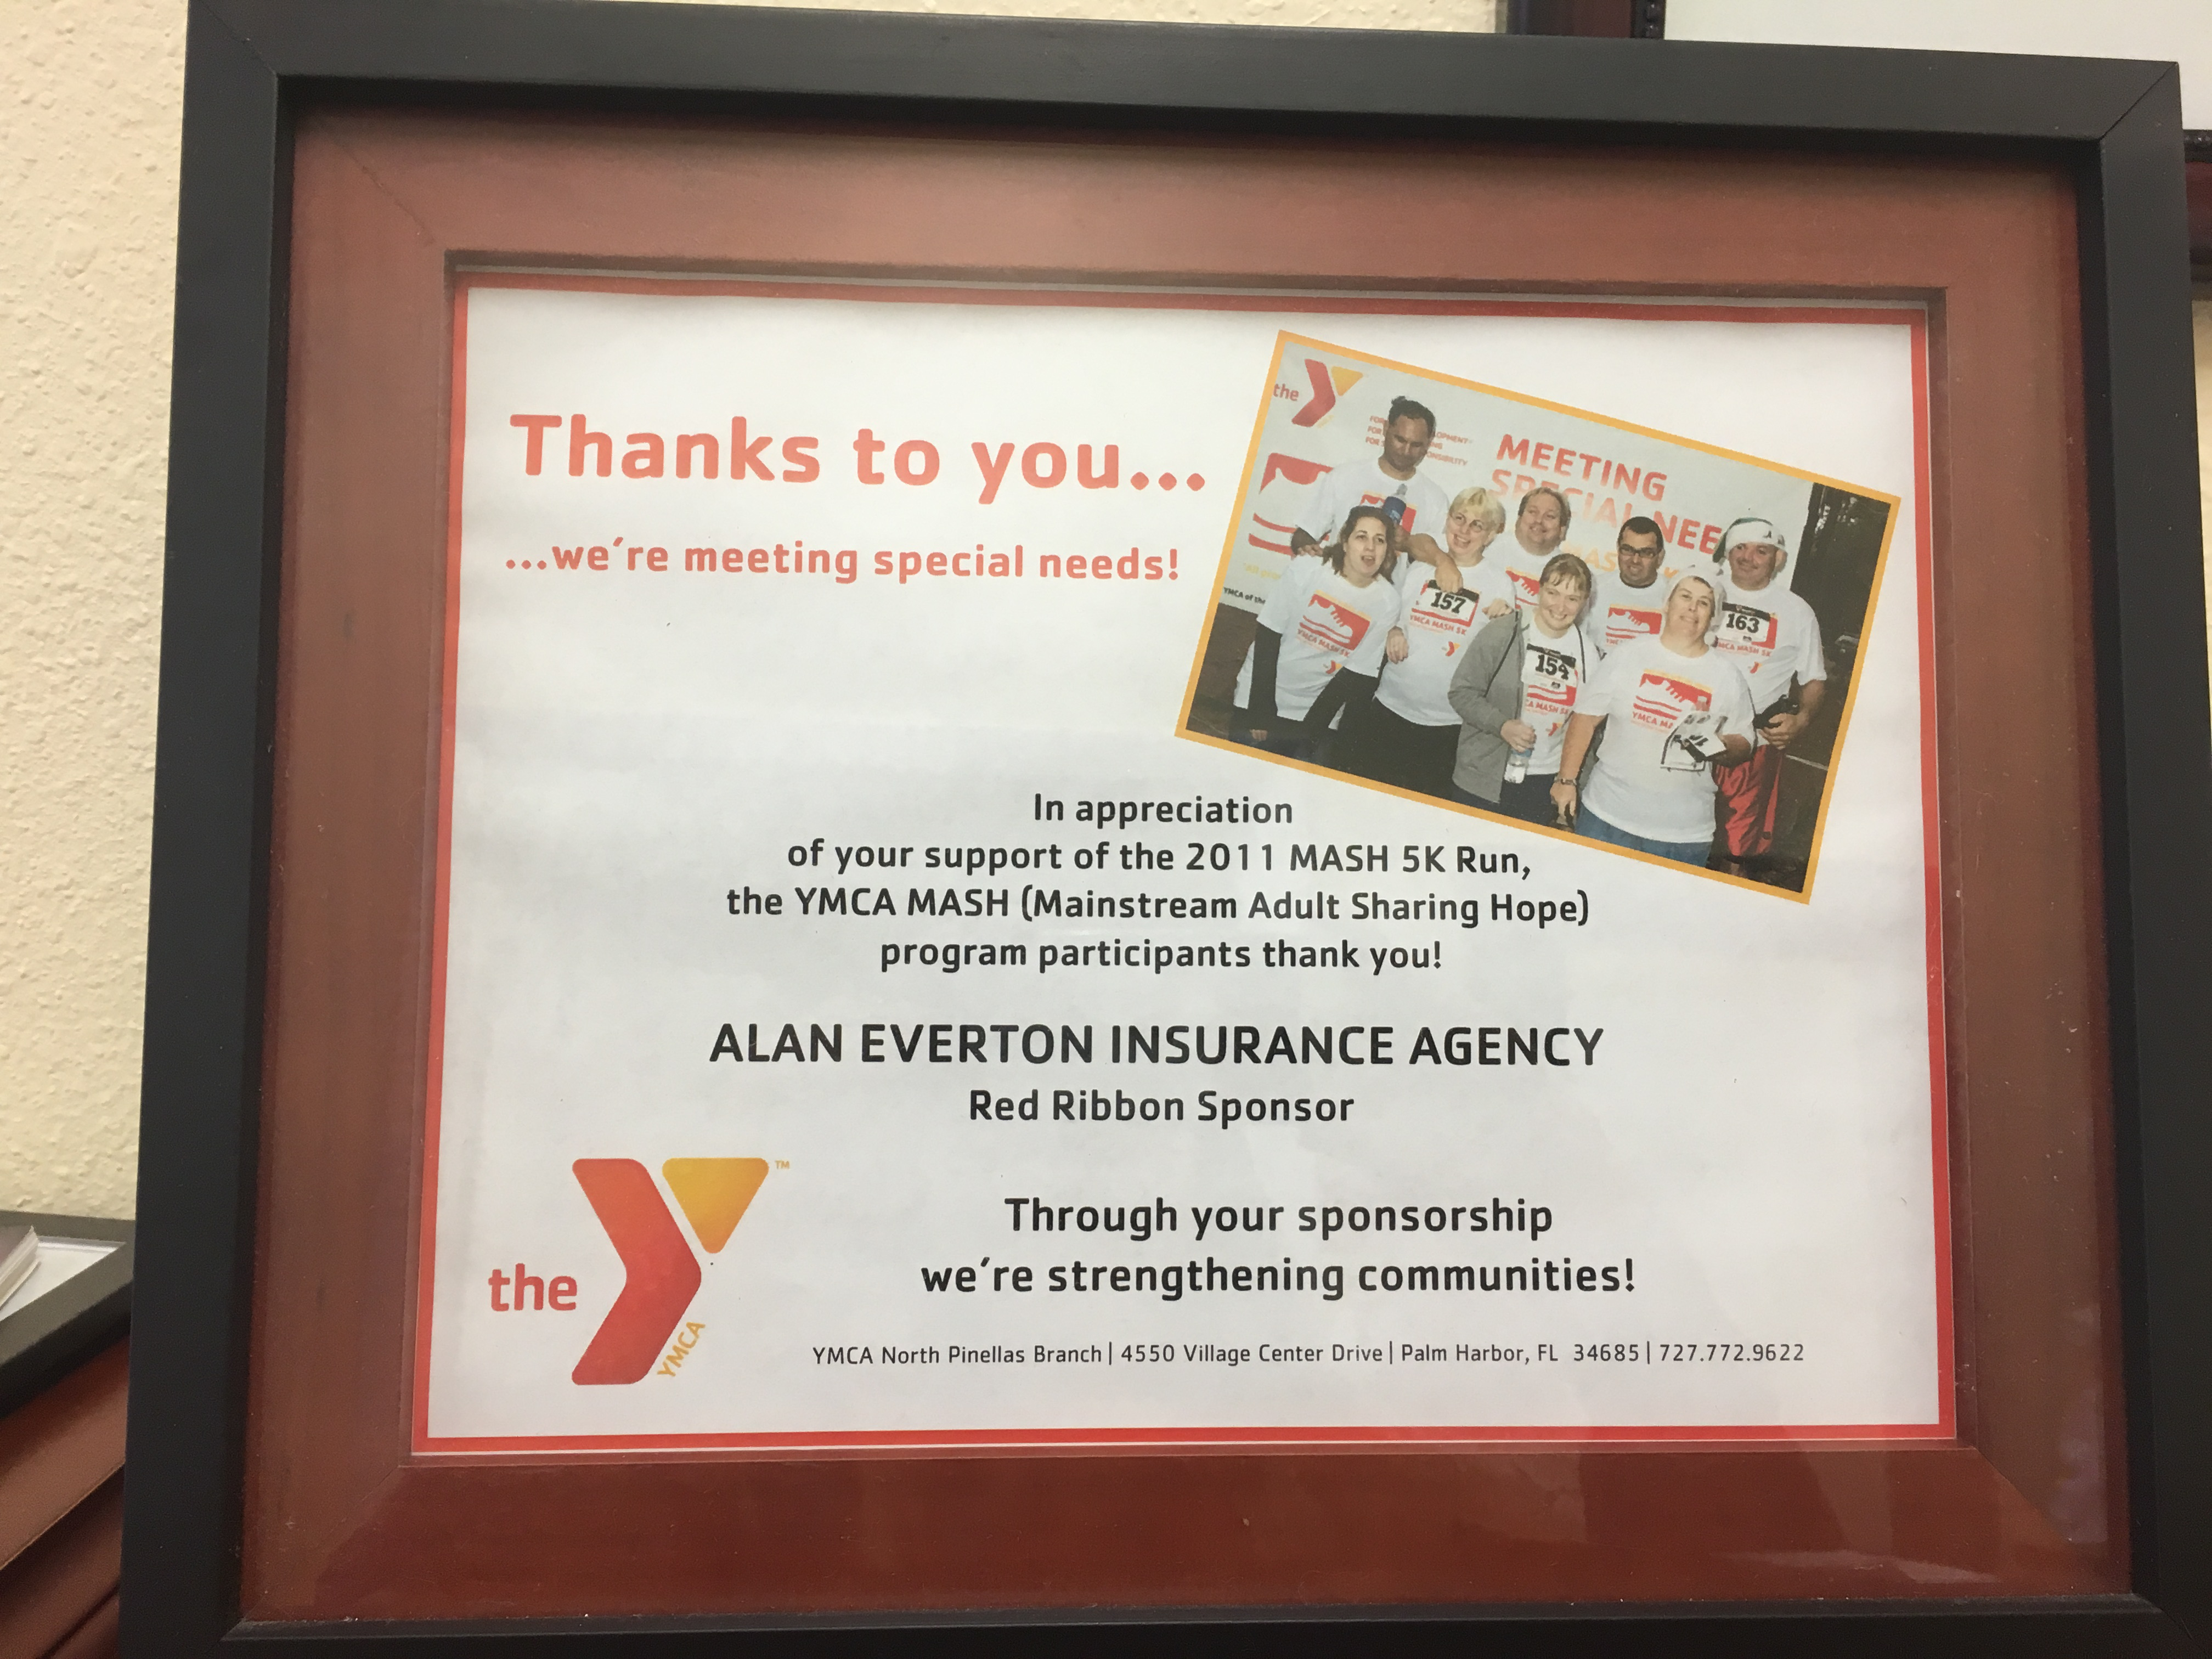 Alan A. Everton: Allstate Insurance image 6